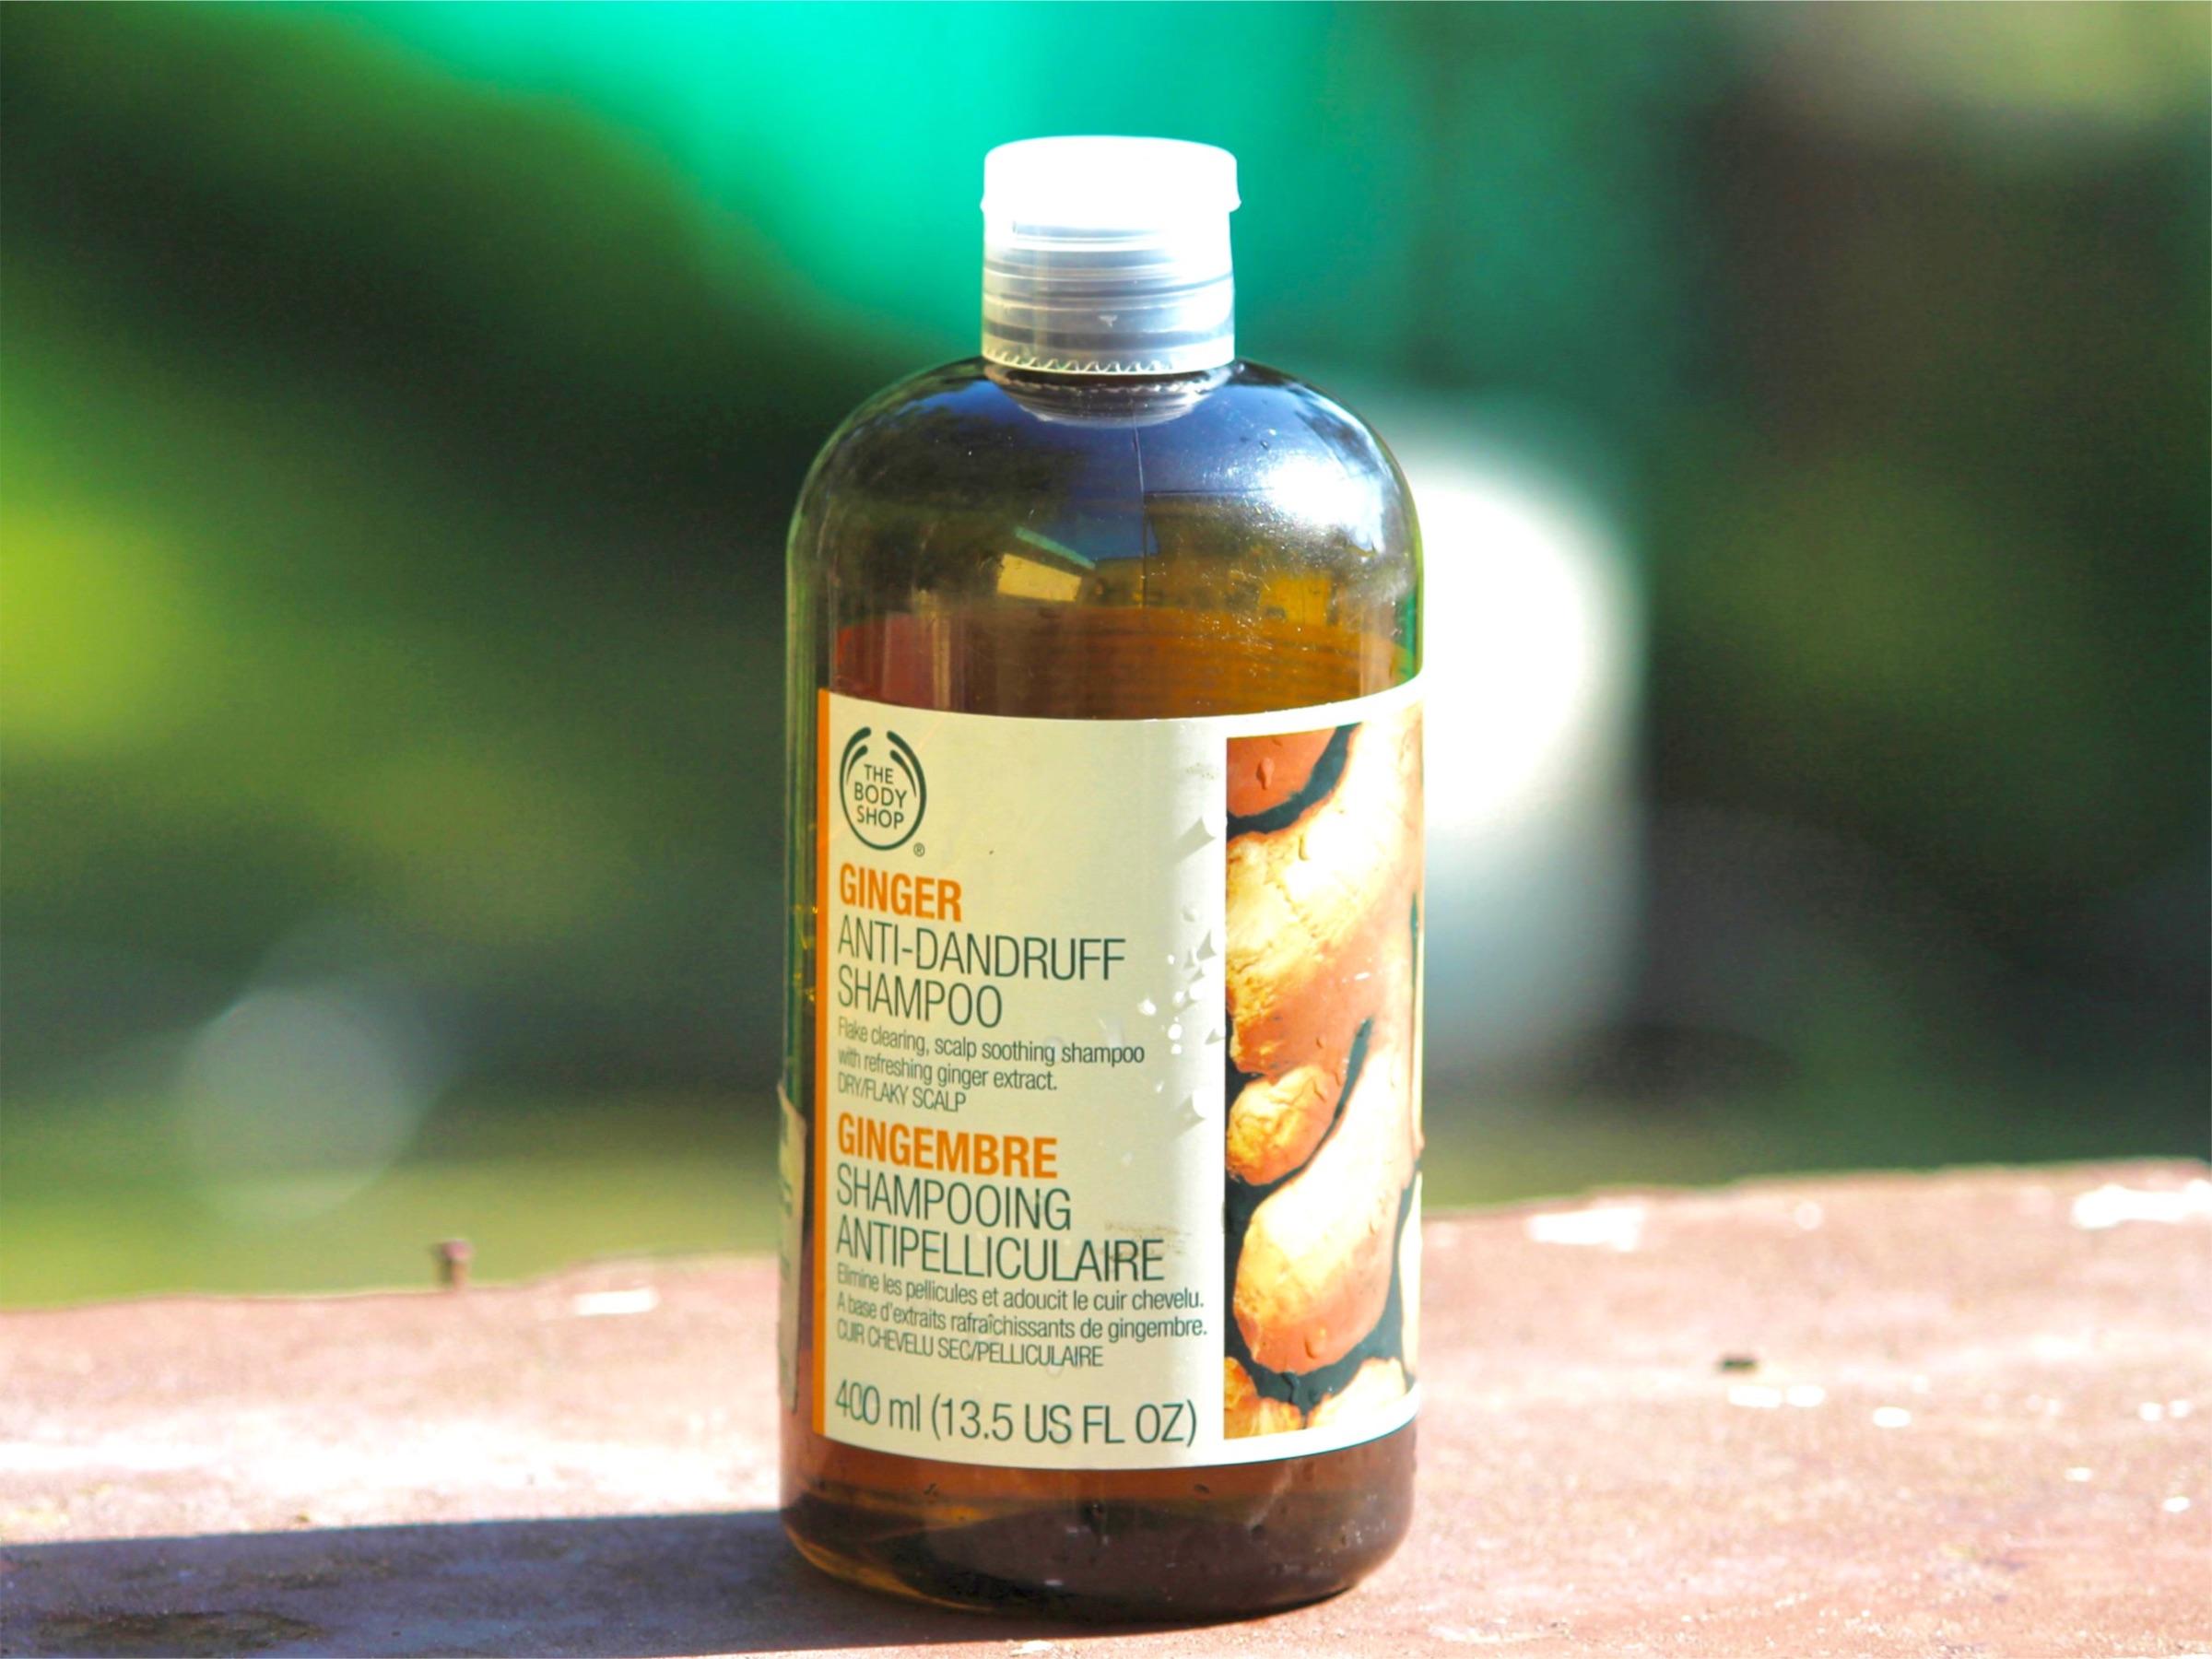 584af745e5f The Body Shop Ginger Anti Dandruff Shampoo Review